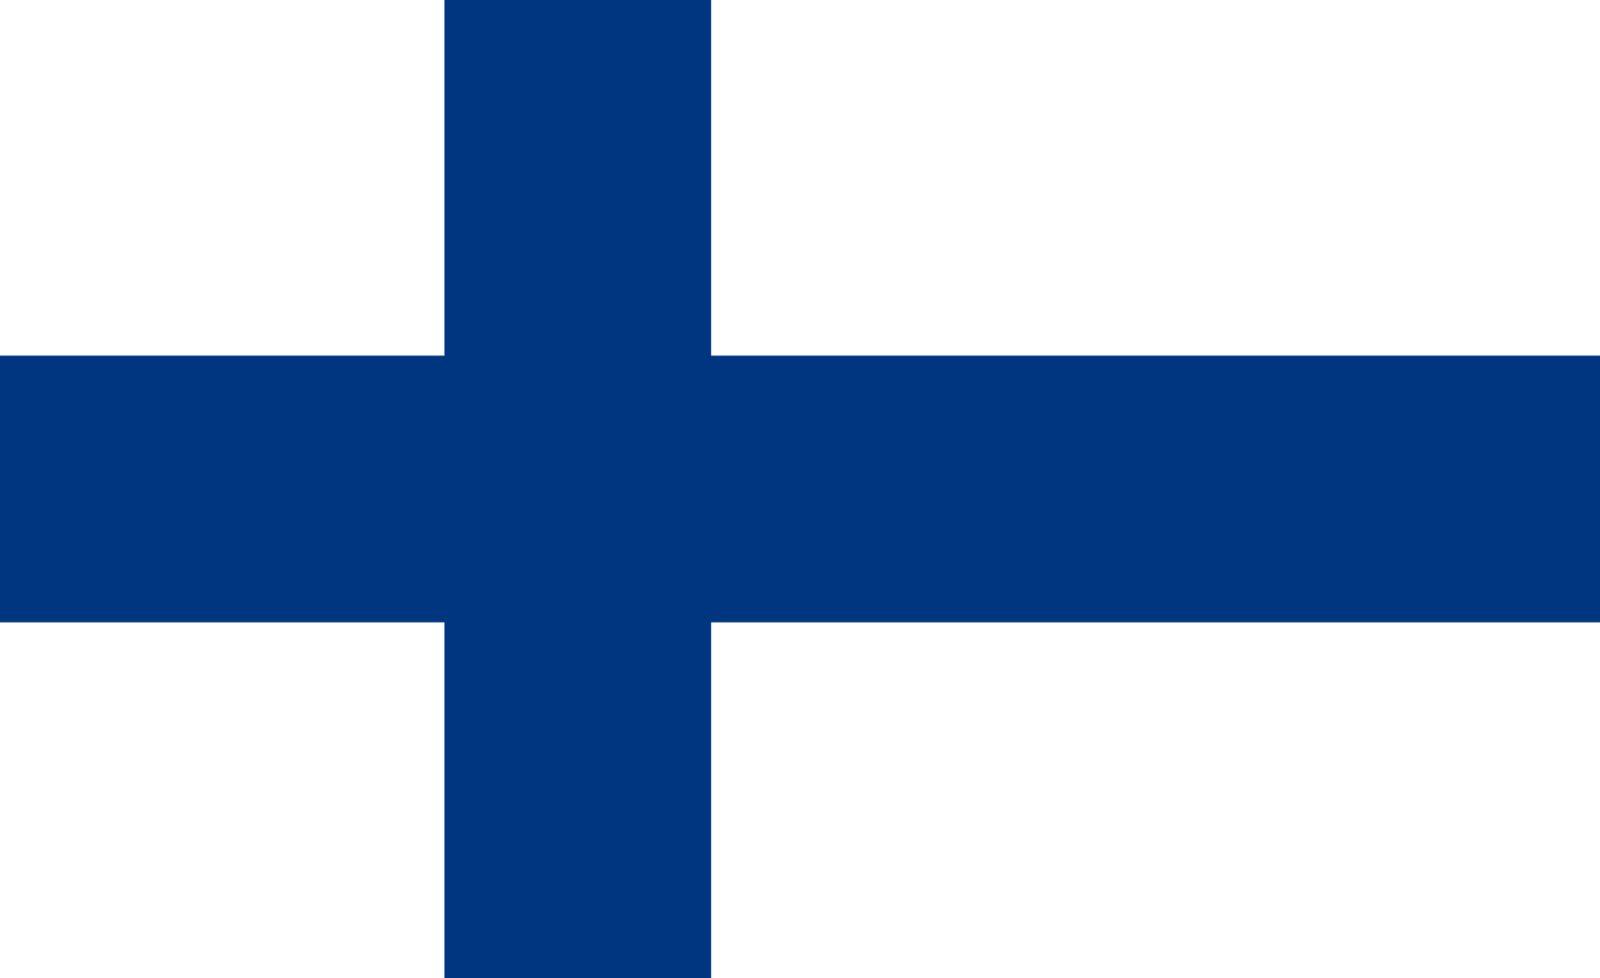 EWHEELZ_main_street_legal_finnland_1